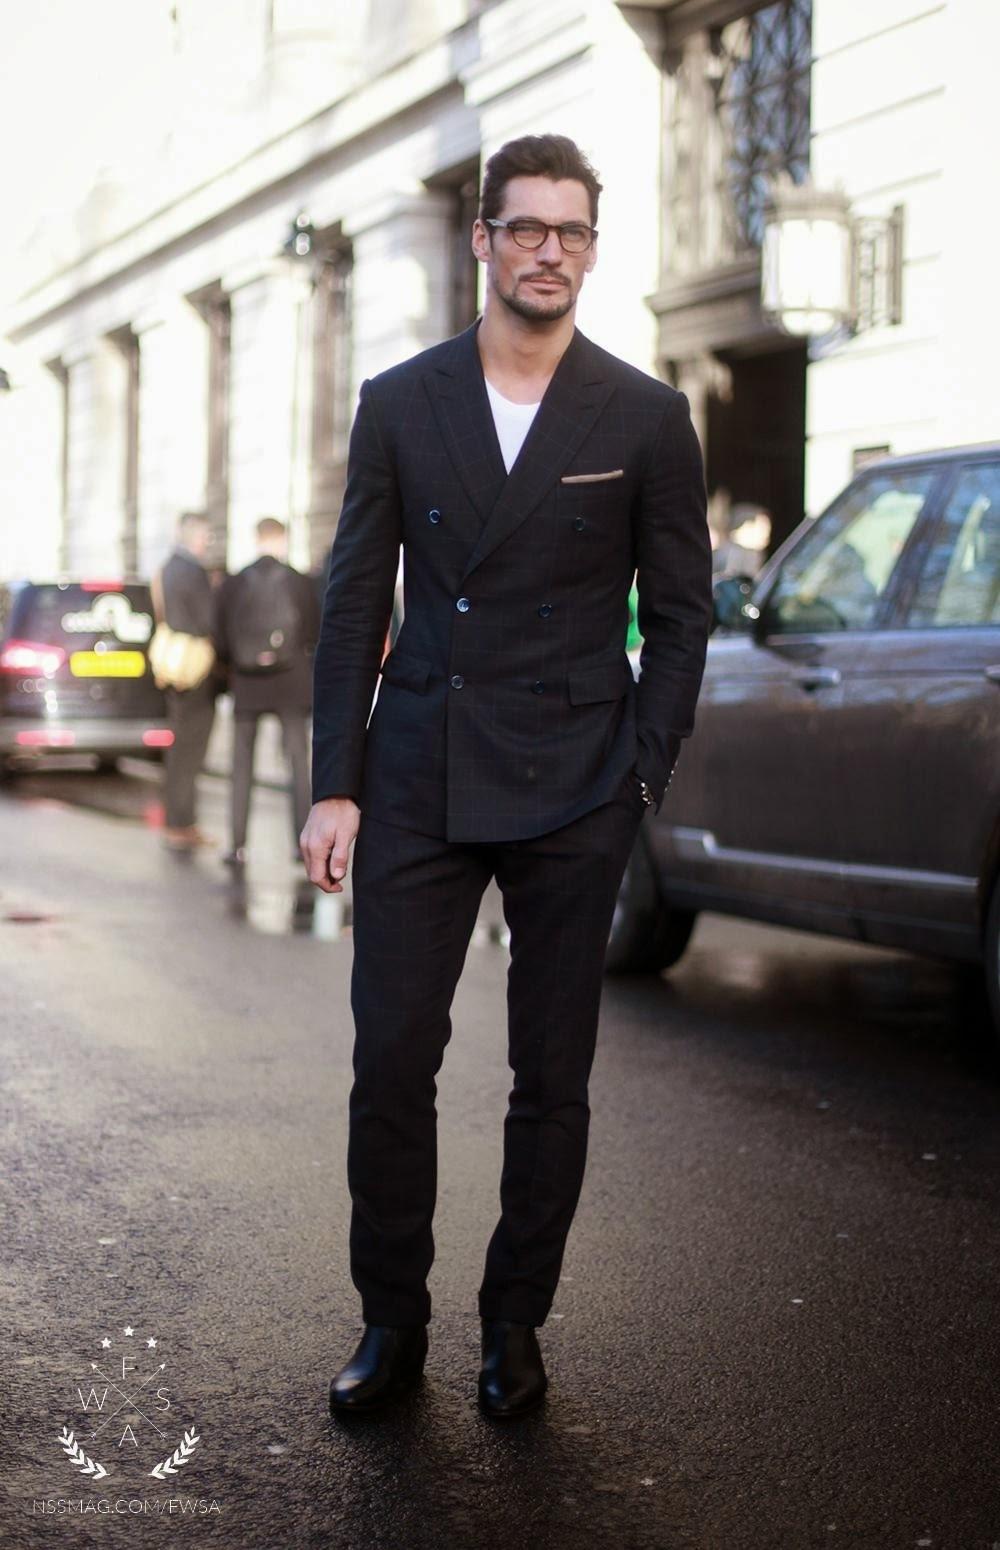 promo code 5cc9b 357e8 David Gandy trägt schwarzer Anzug mit Karomuster, weißes T ...